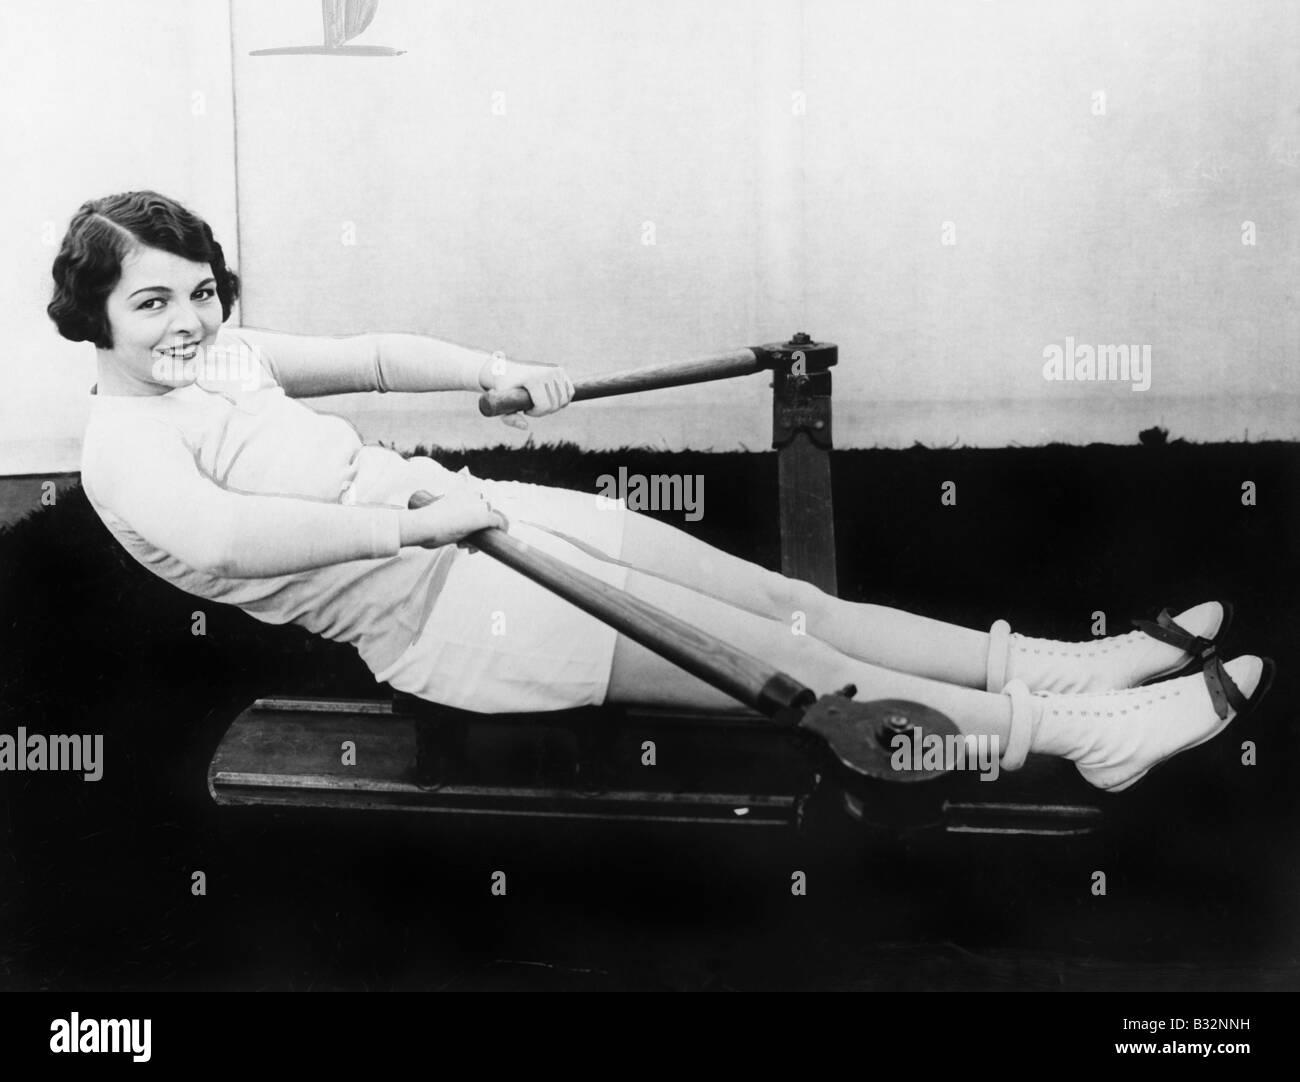 Woman using rowing machine - Stock Image